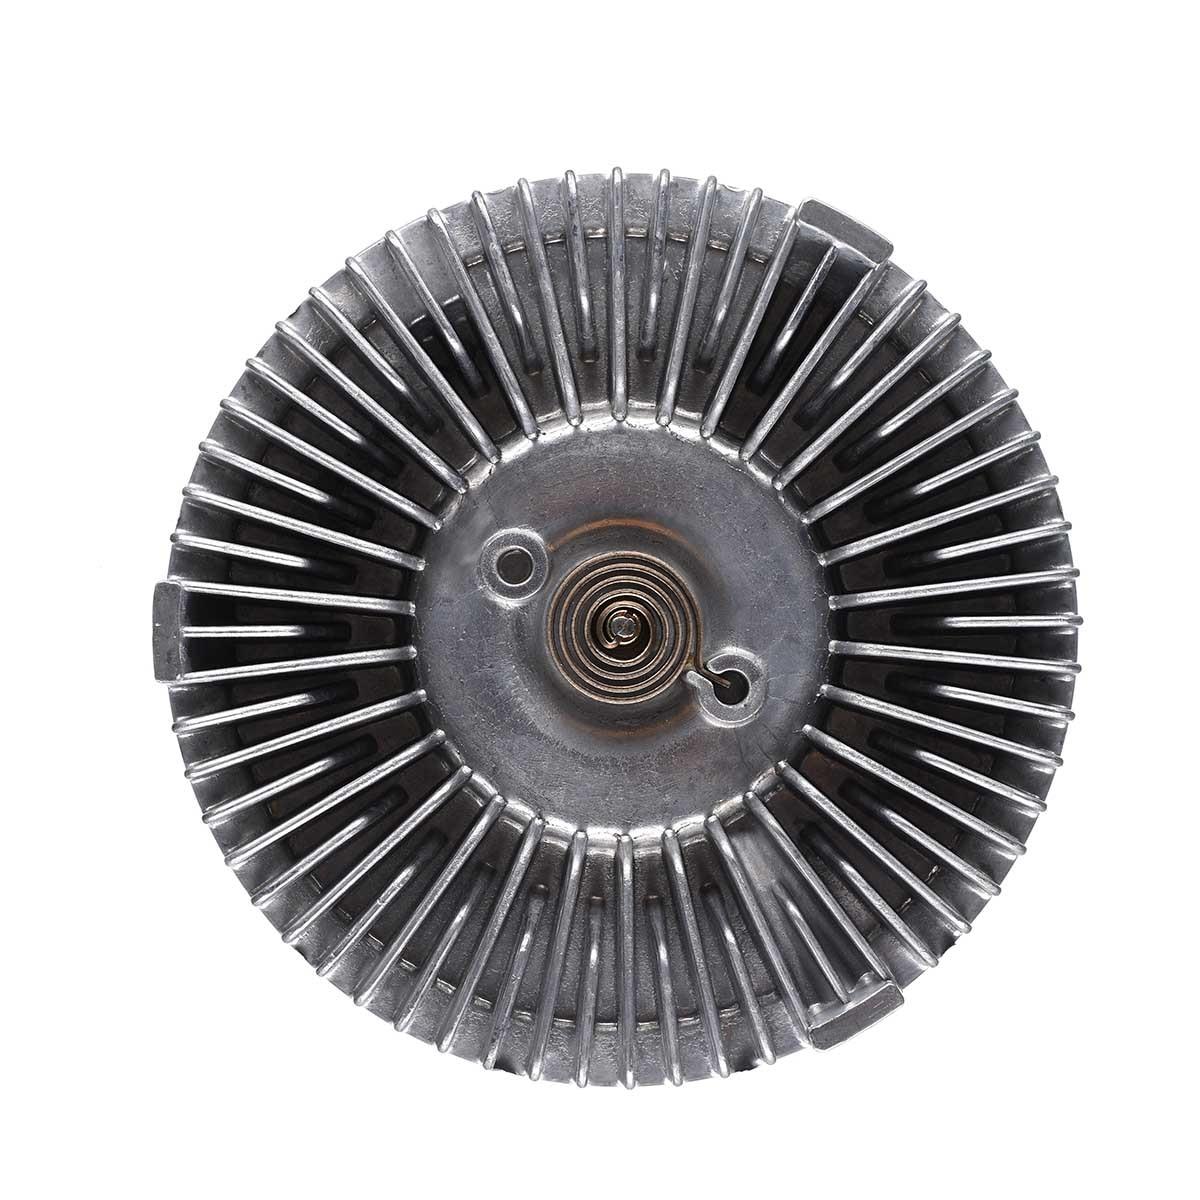 Cooling Fan Clutch 2734 for Chevrolet C//K Pickup Caprice Astro Blazer GMC Jimmy